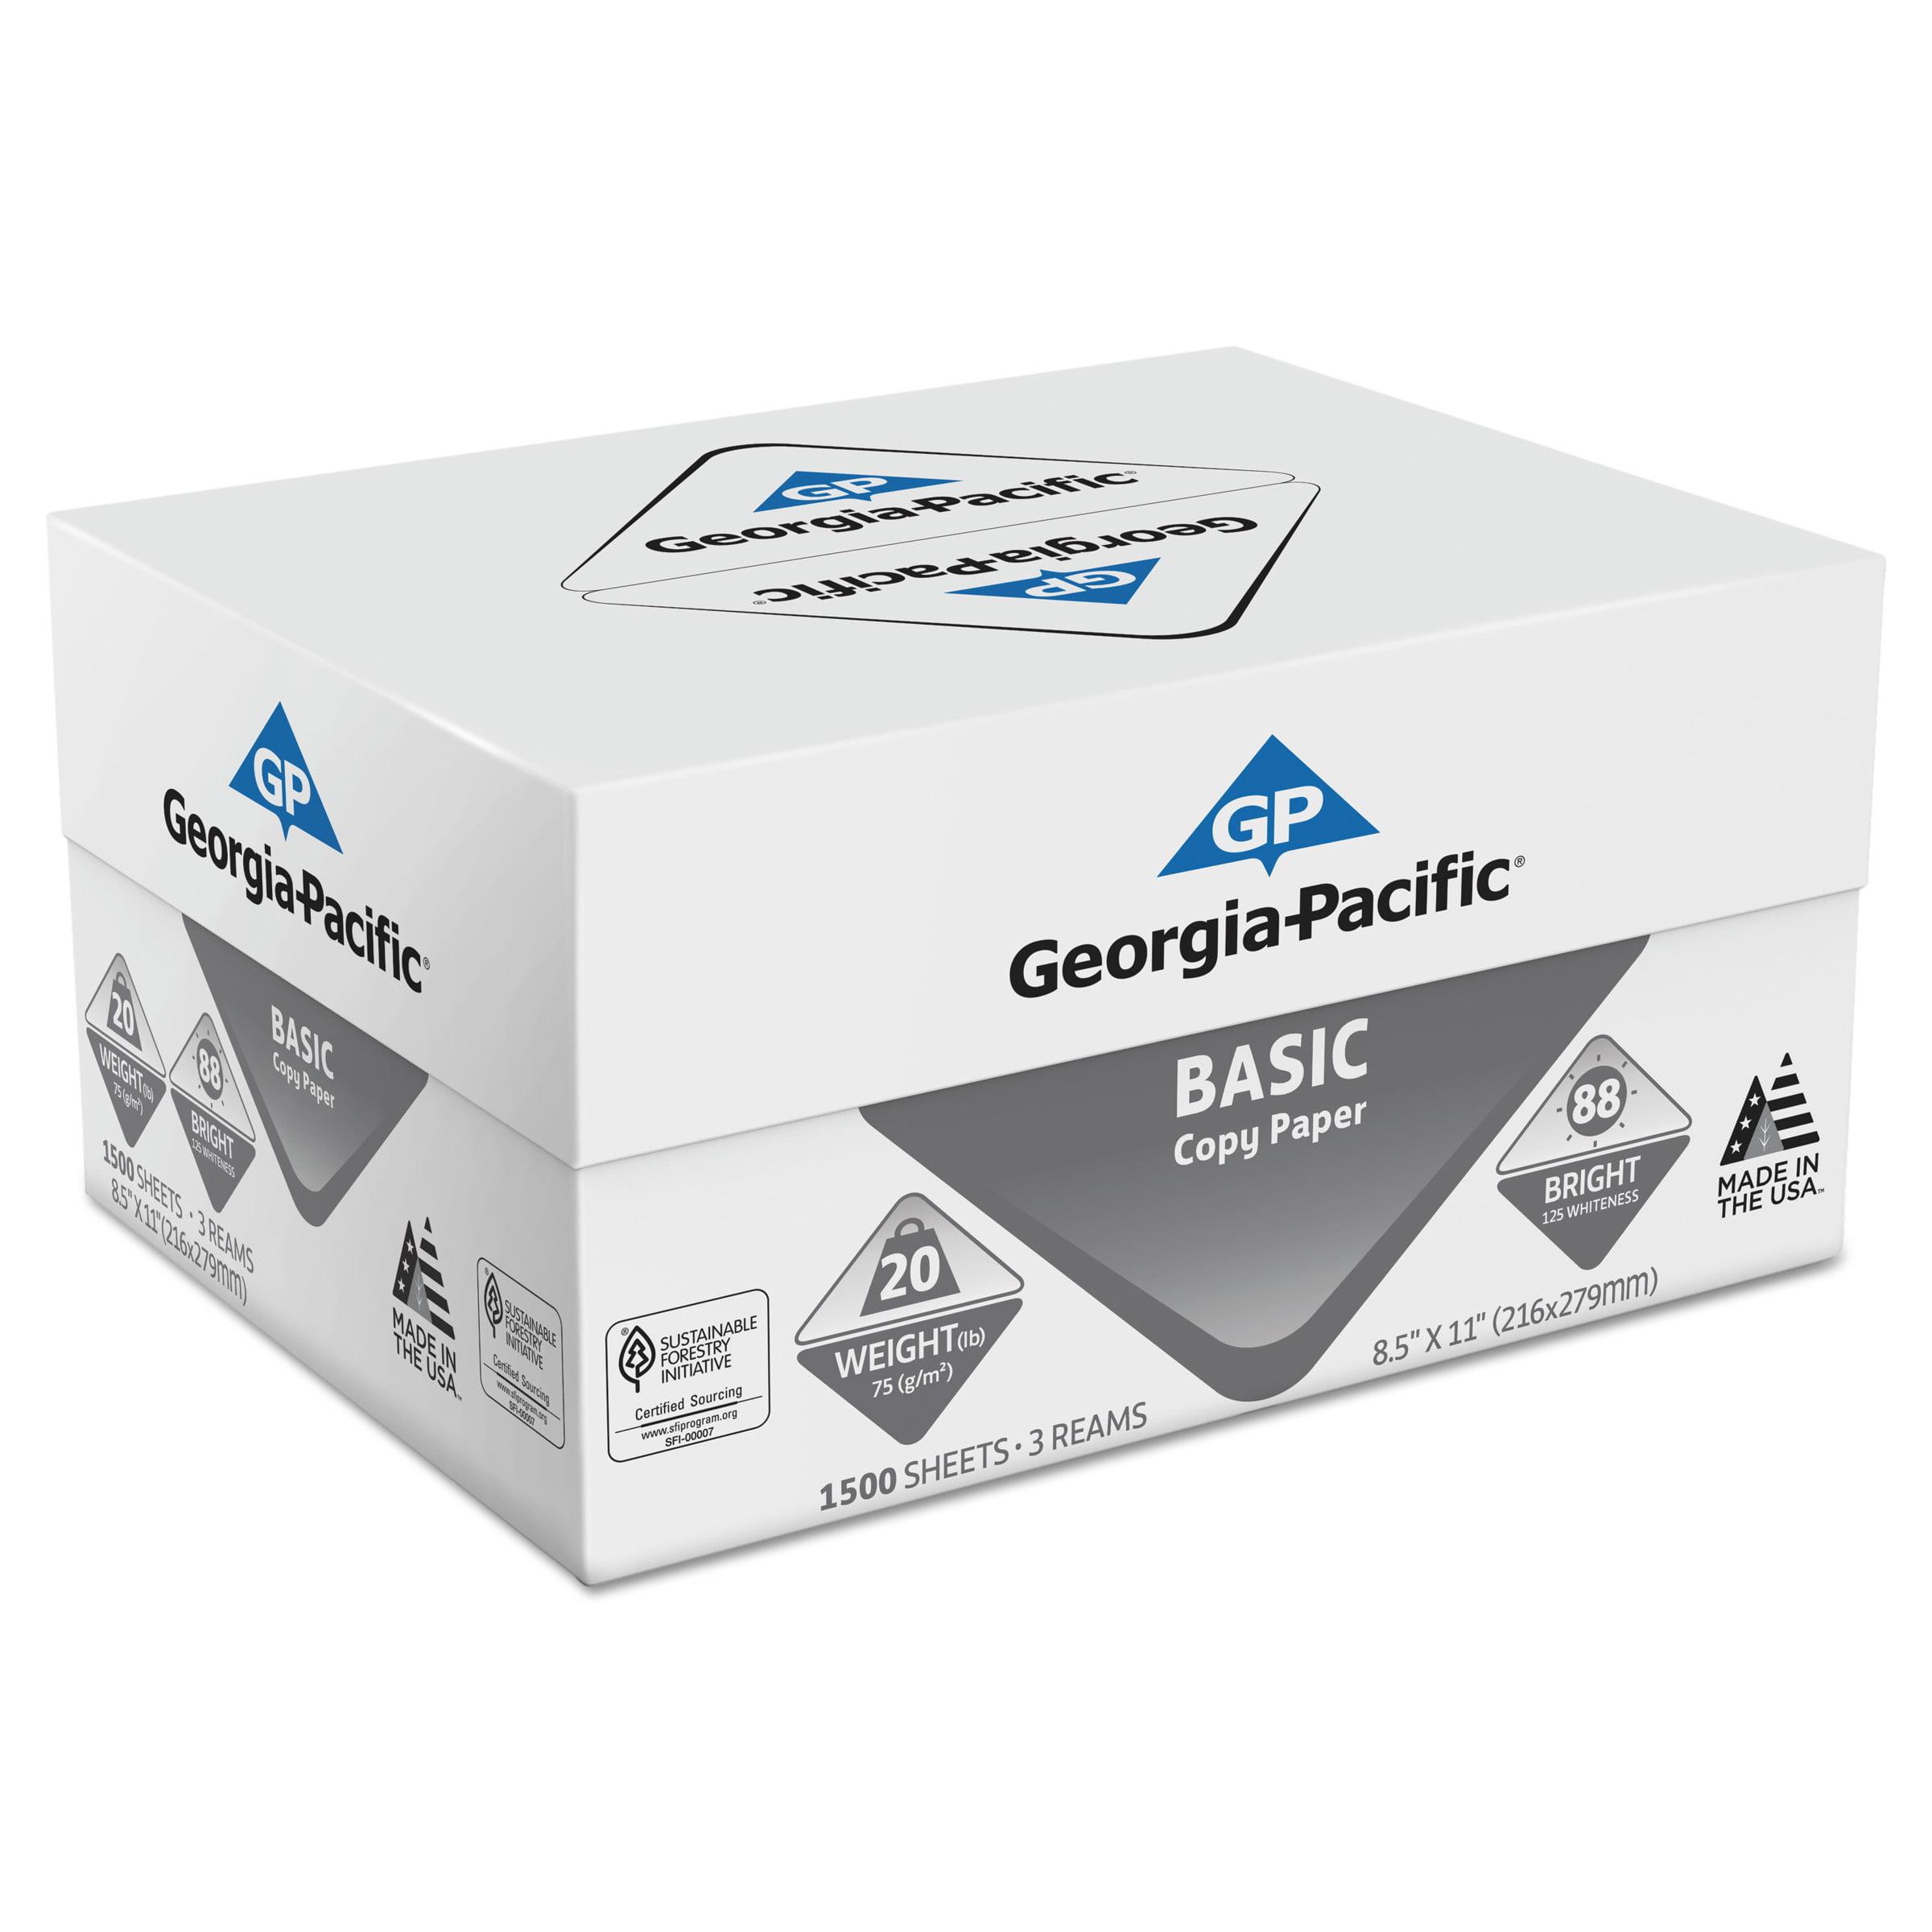 boise x 9 copy paper 92 brightness 8 5 x 11 white 5000 sheets